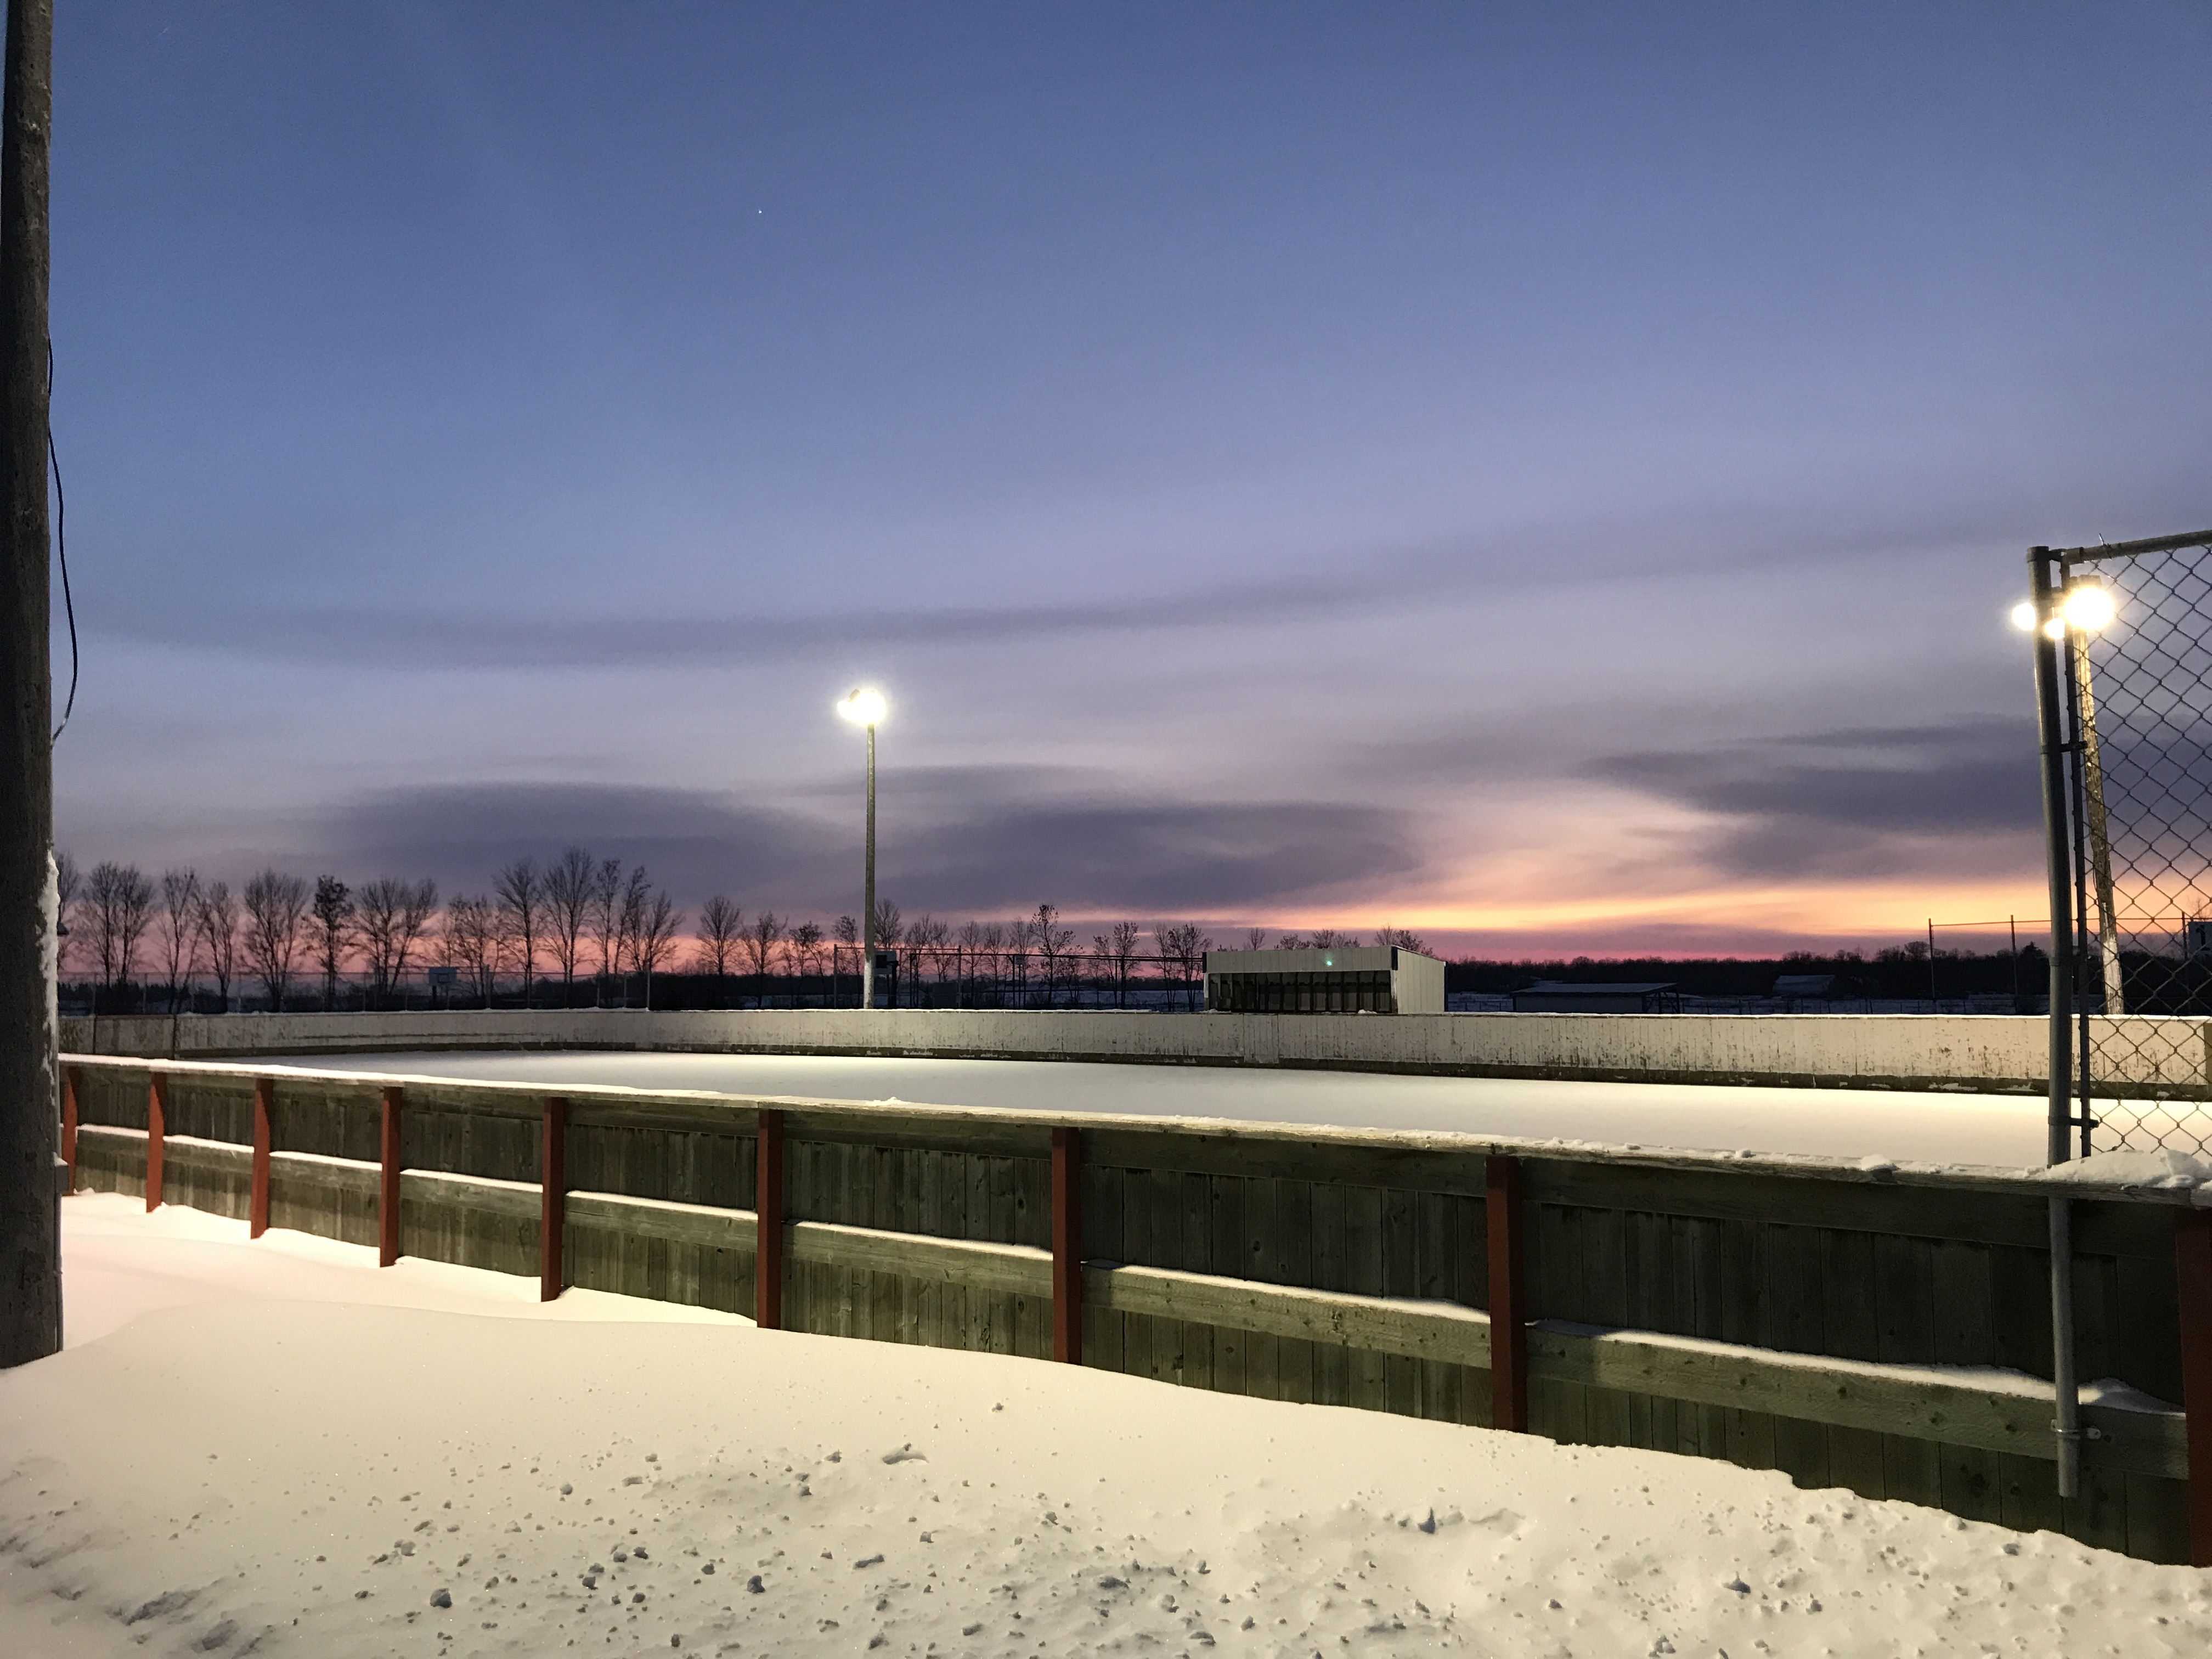 Blumenort Recreation - Outdoor Rink Closed